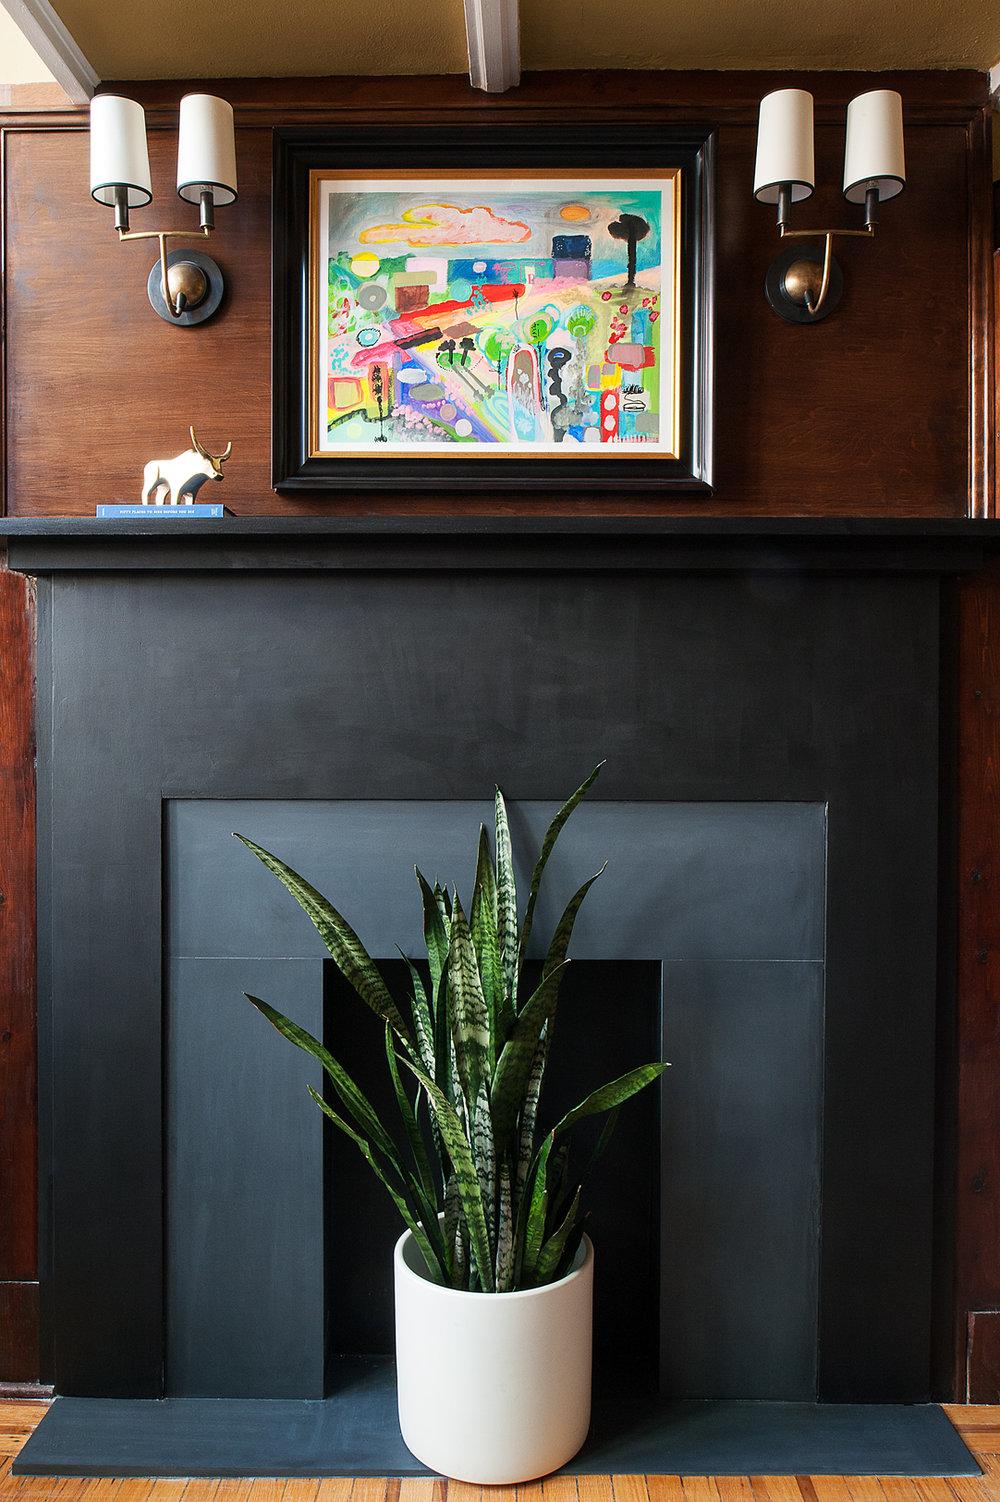 lombard_fireplace.jpg